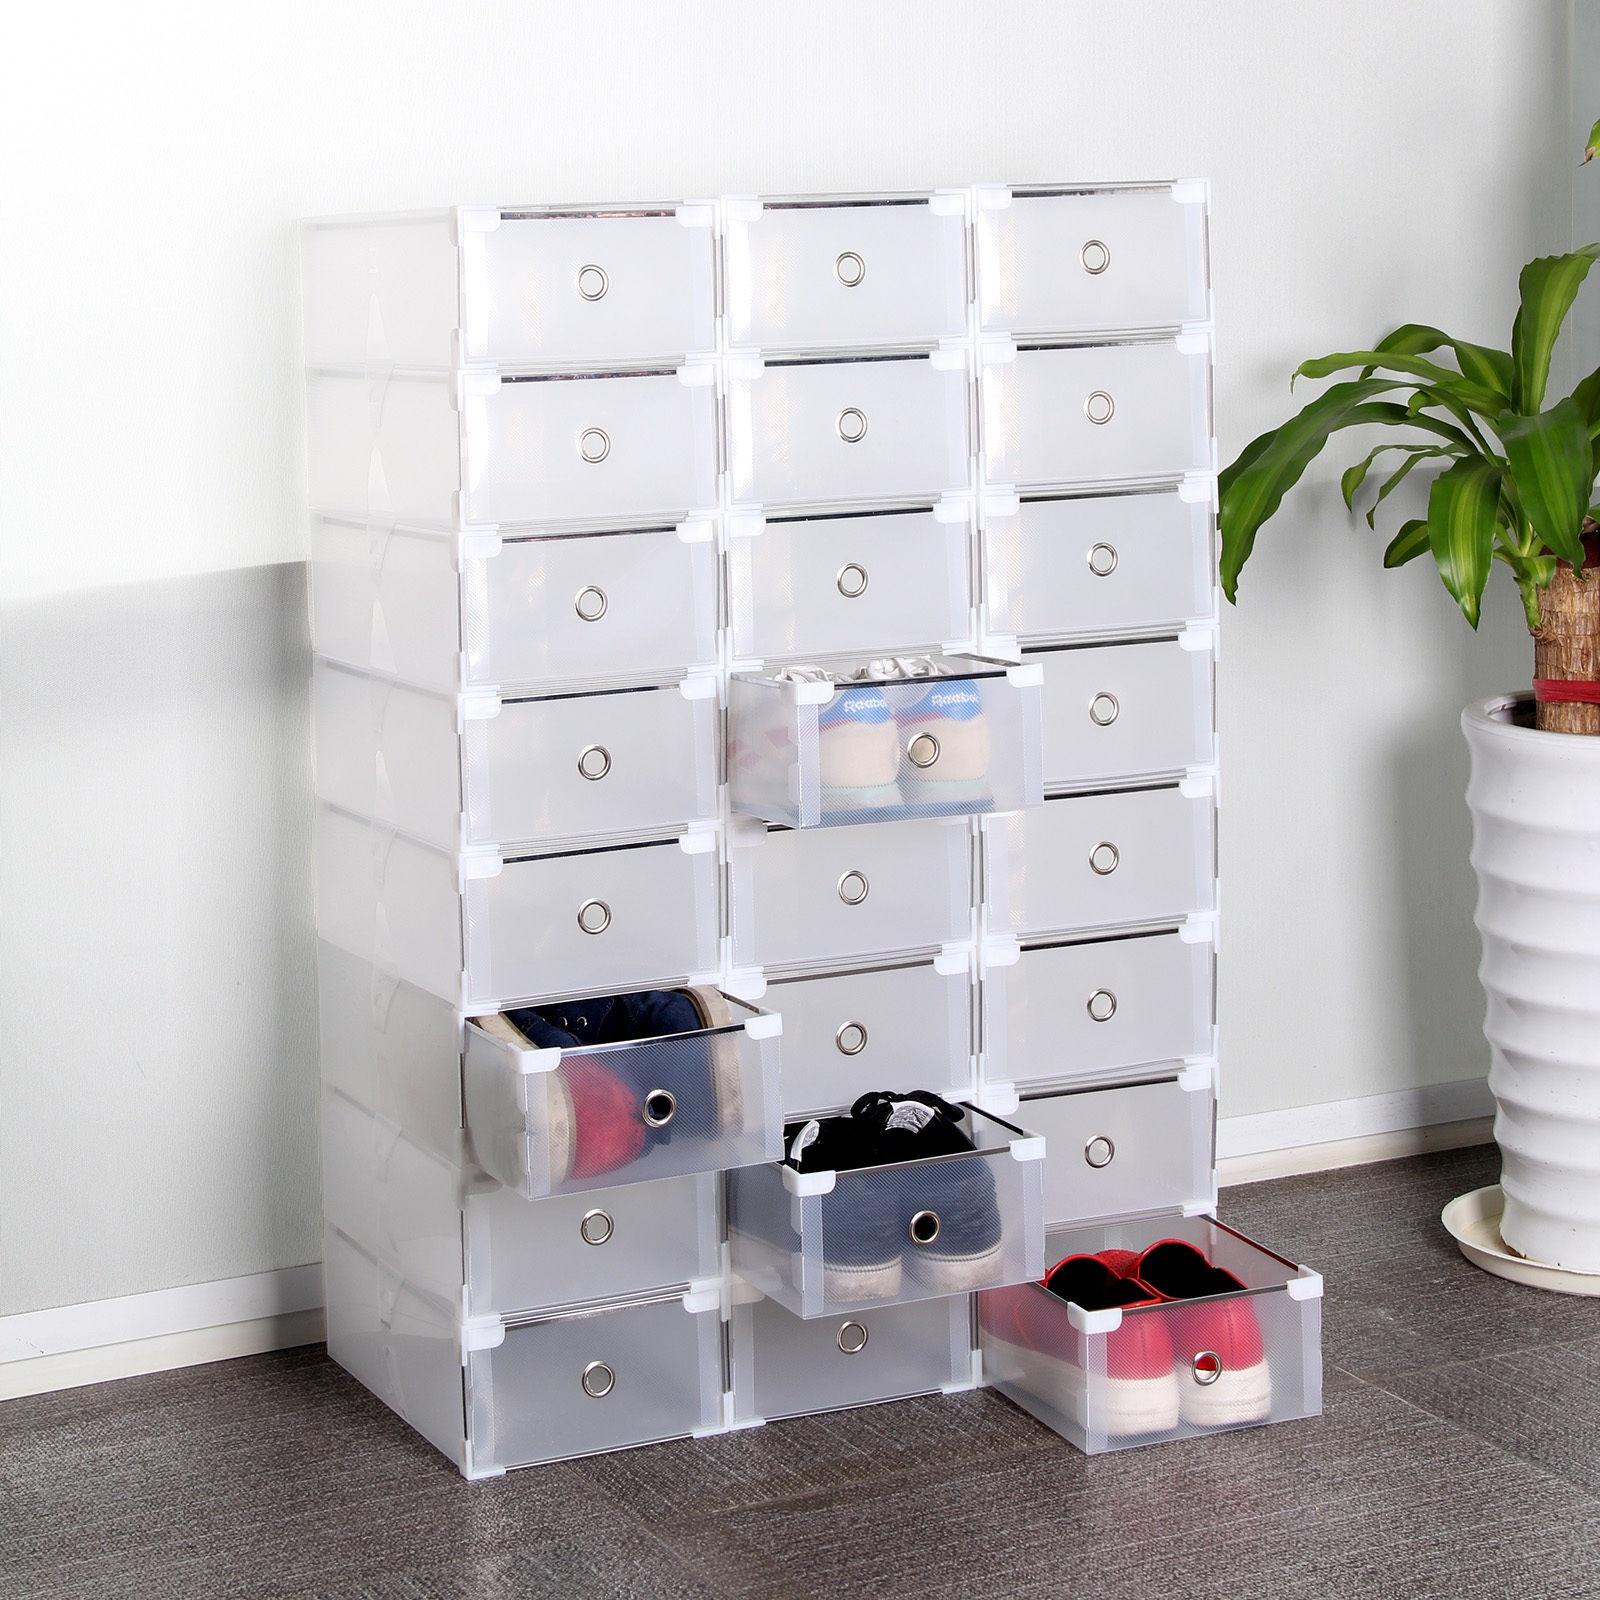 24-Foldable-Plastic-Shoe-Boxes-Organiser-Drawer-Stackable-Storage-Box-Transparen